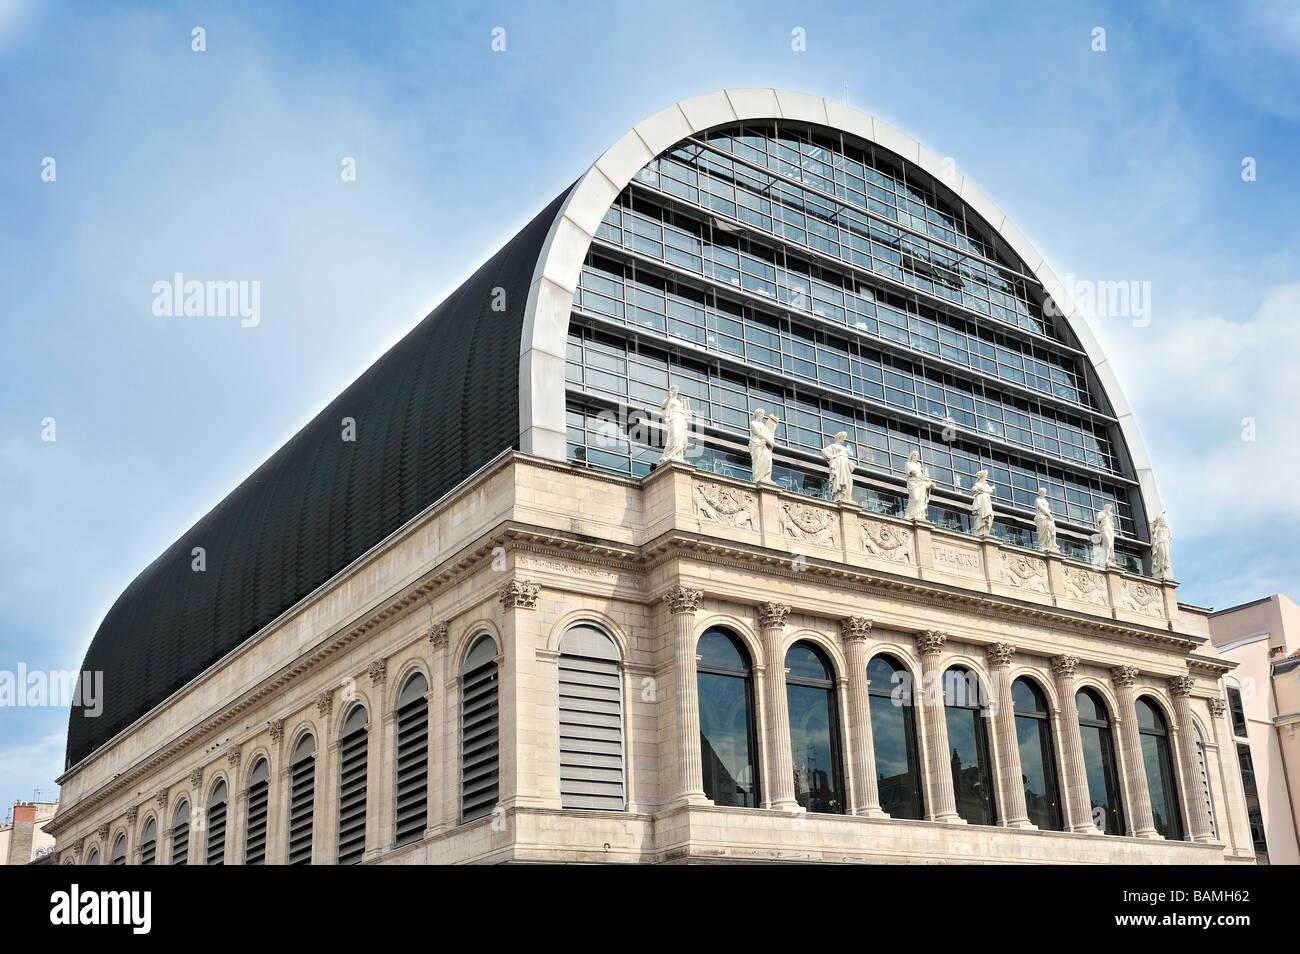 The opera house at Lyon, France. - Stock Image